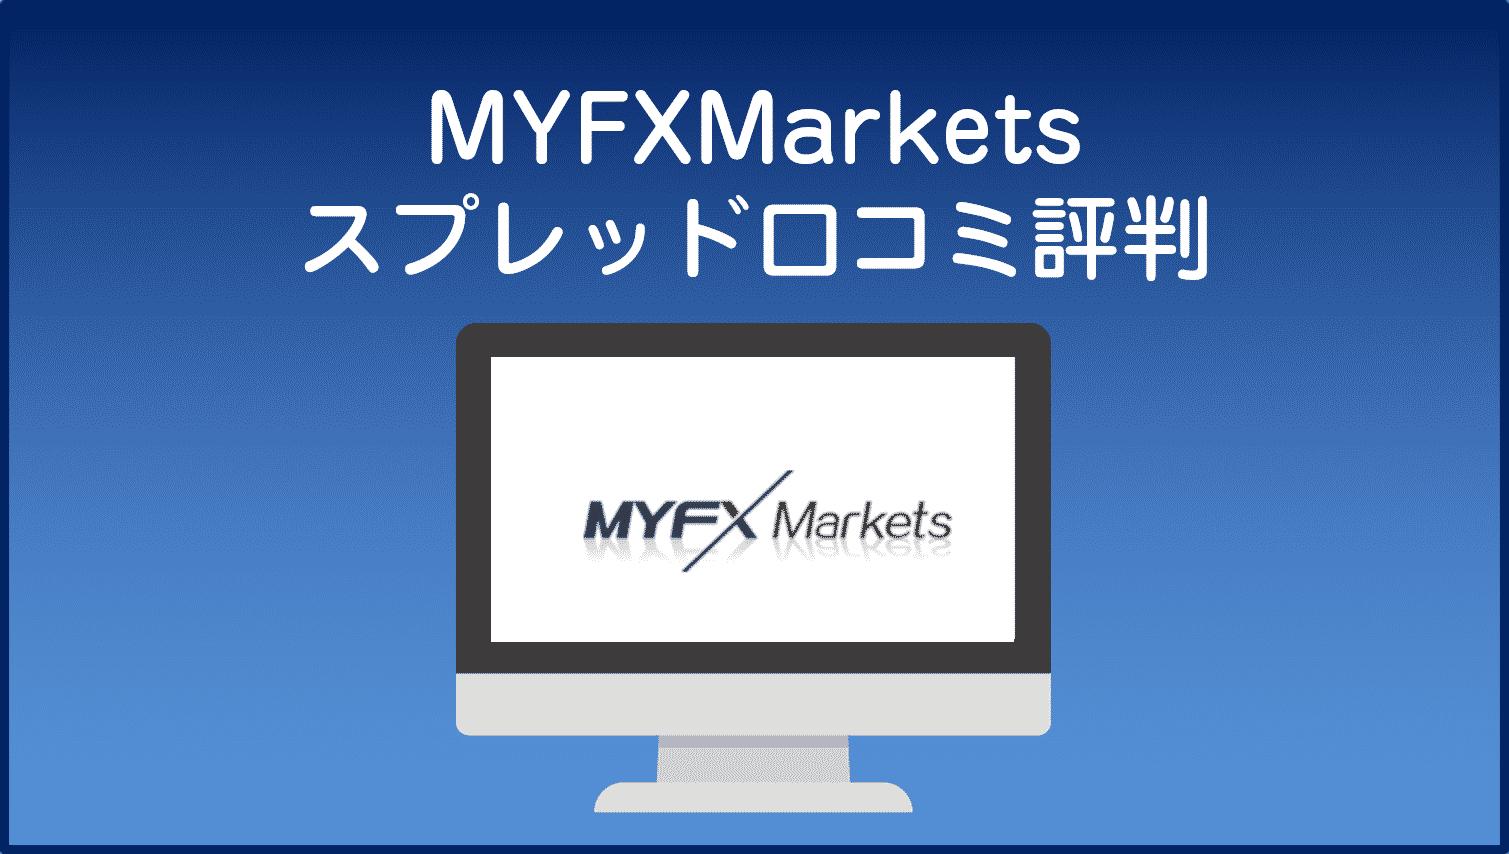 MYFXMarketsスプレッド口コミ・評判